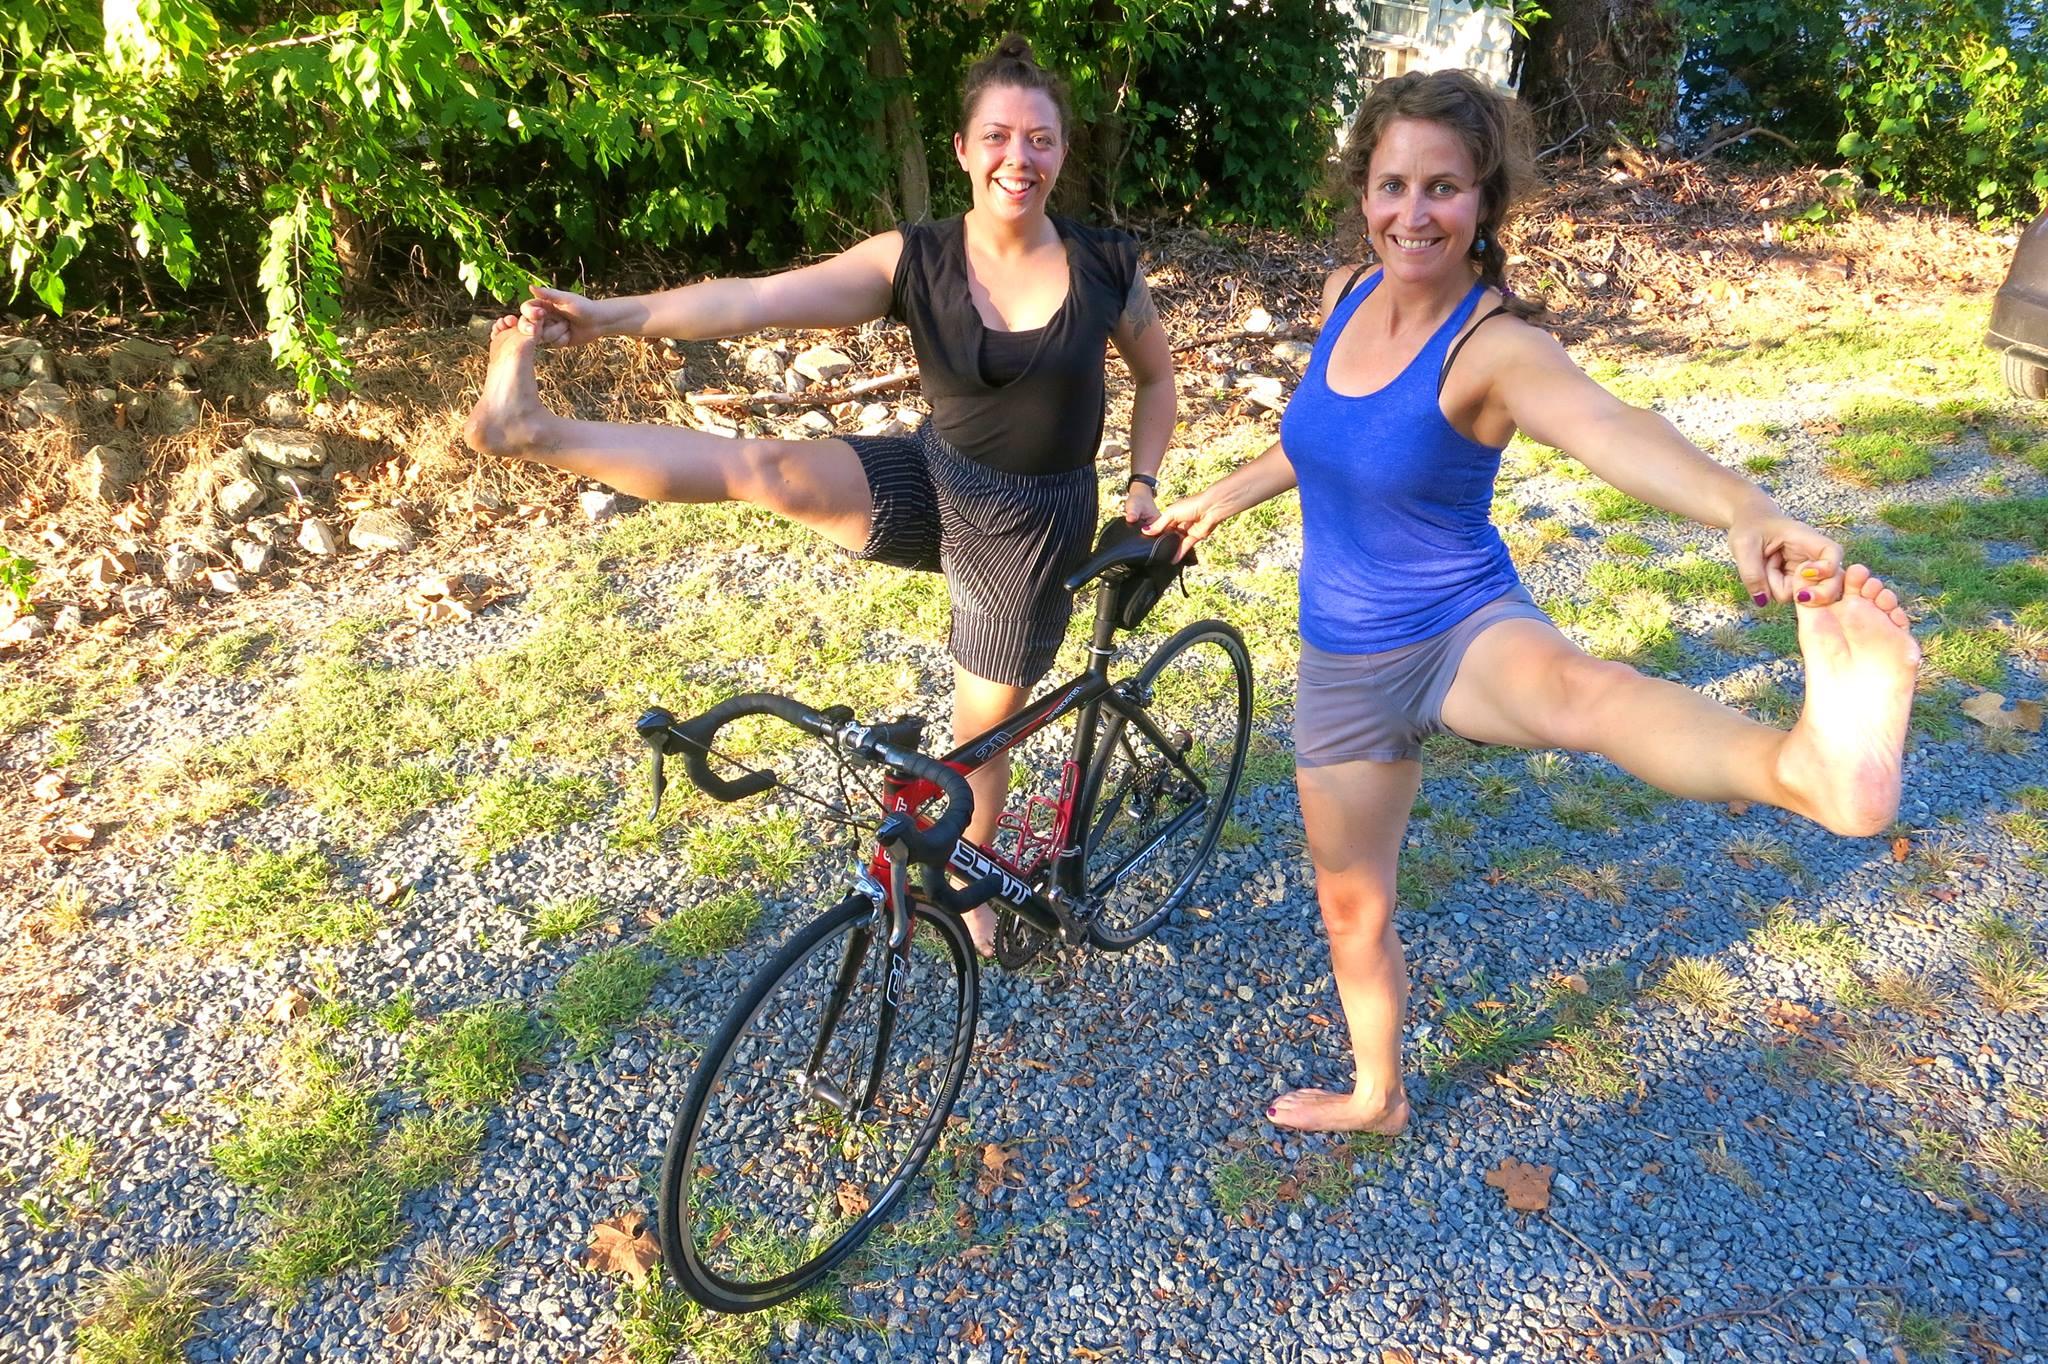 8fcc3f9959d User-uploaded image for BIGA - Bike Yoga